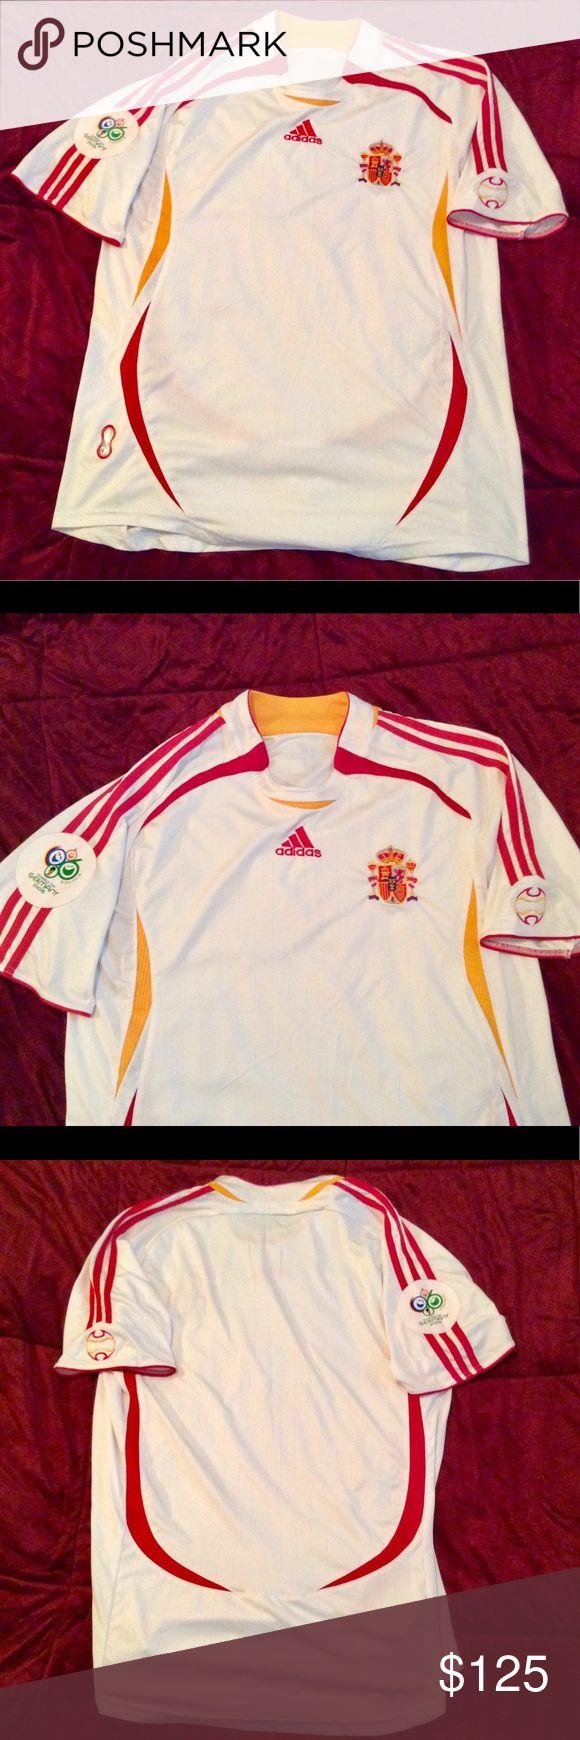 Mint Condition Spanish World Cup Jersey 2006 World Cup Jerseys Adidas Shirt Sweatshirt Shirt